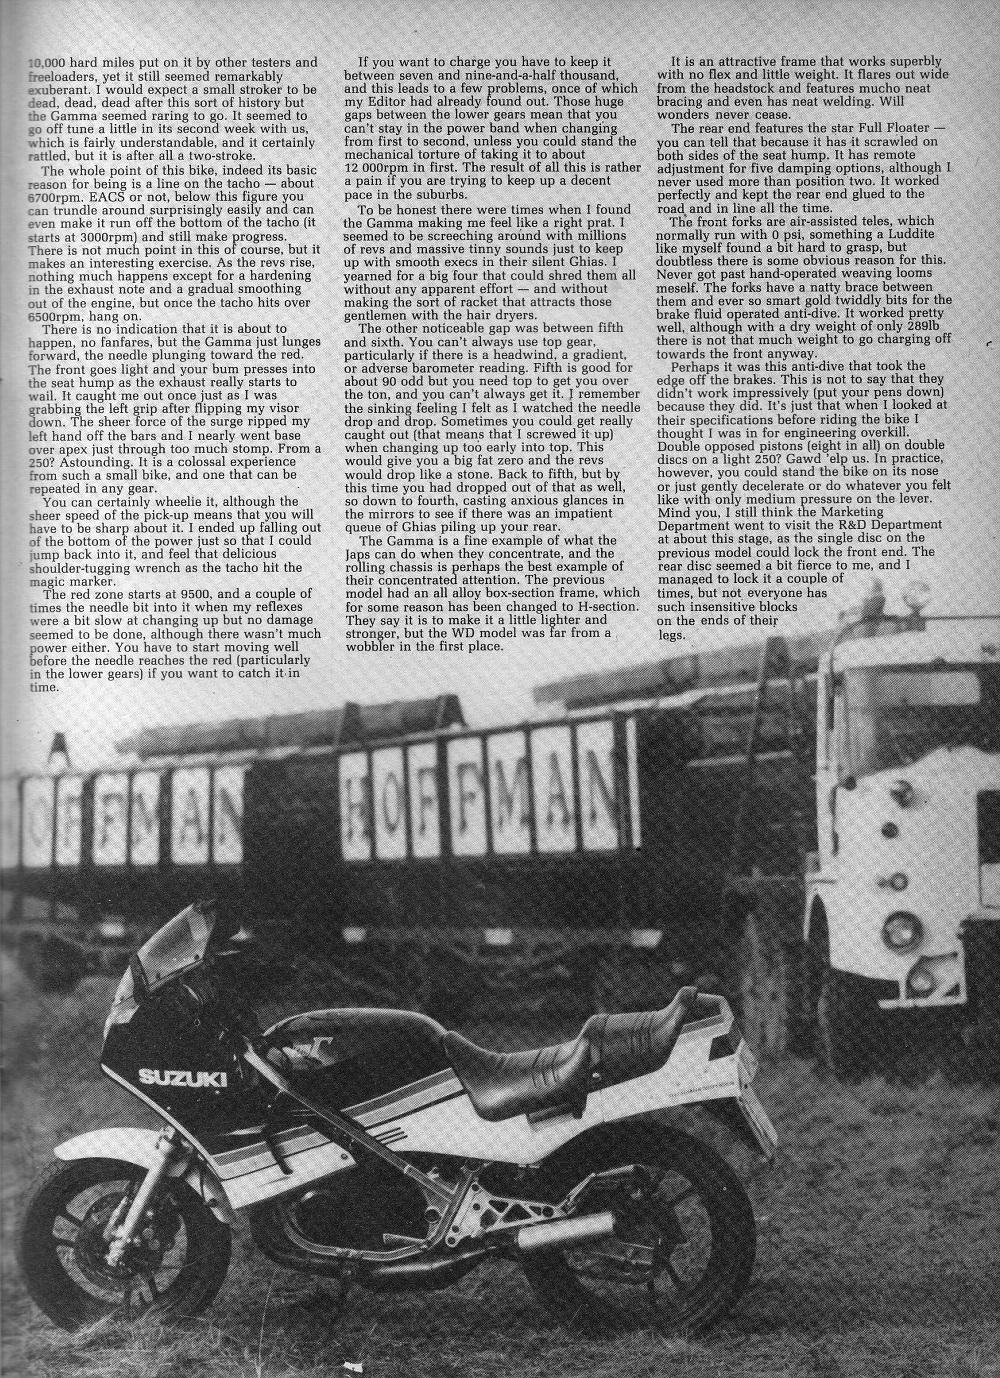 1985 Suzuki RG250 Gamma road test.3.jpg